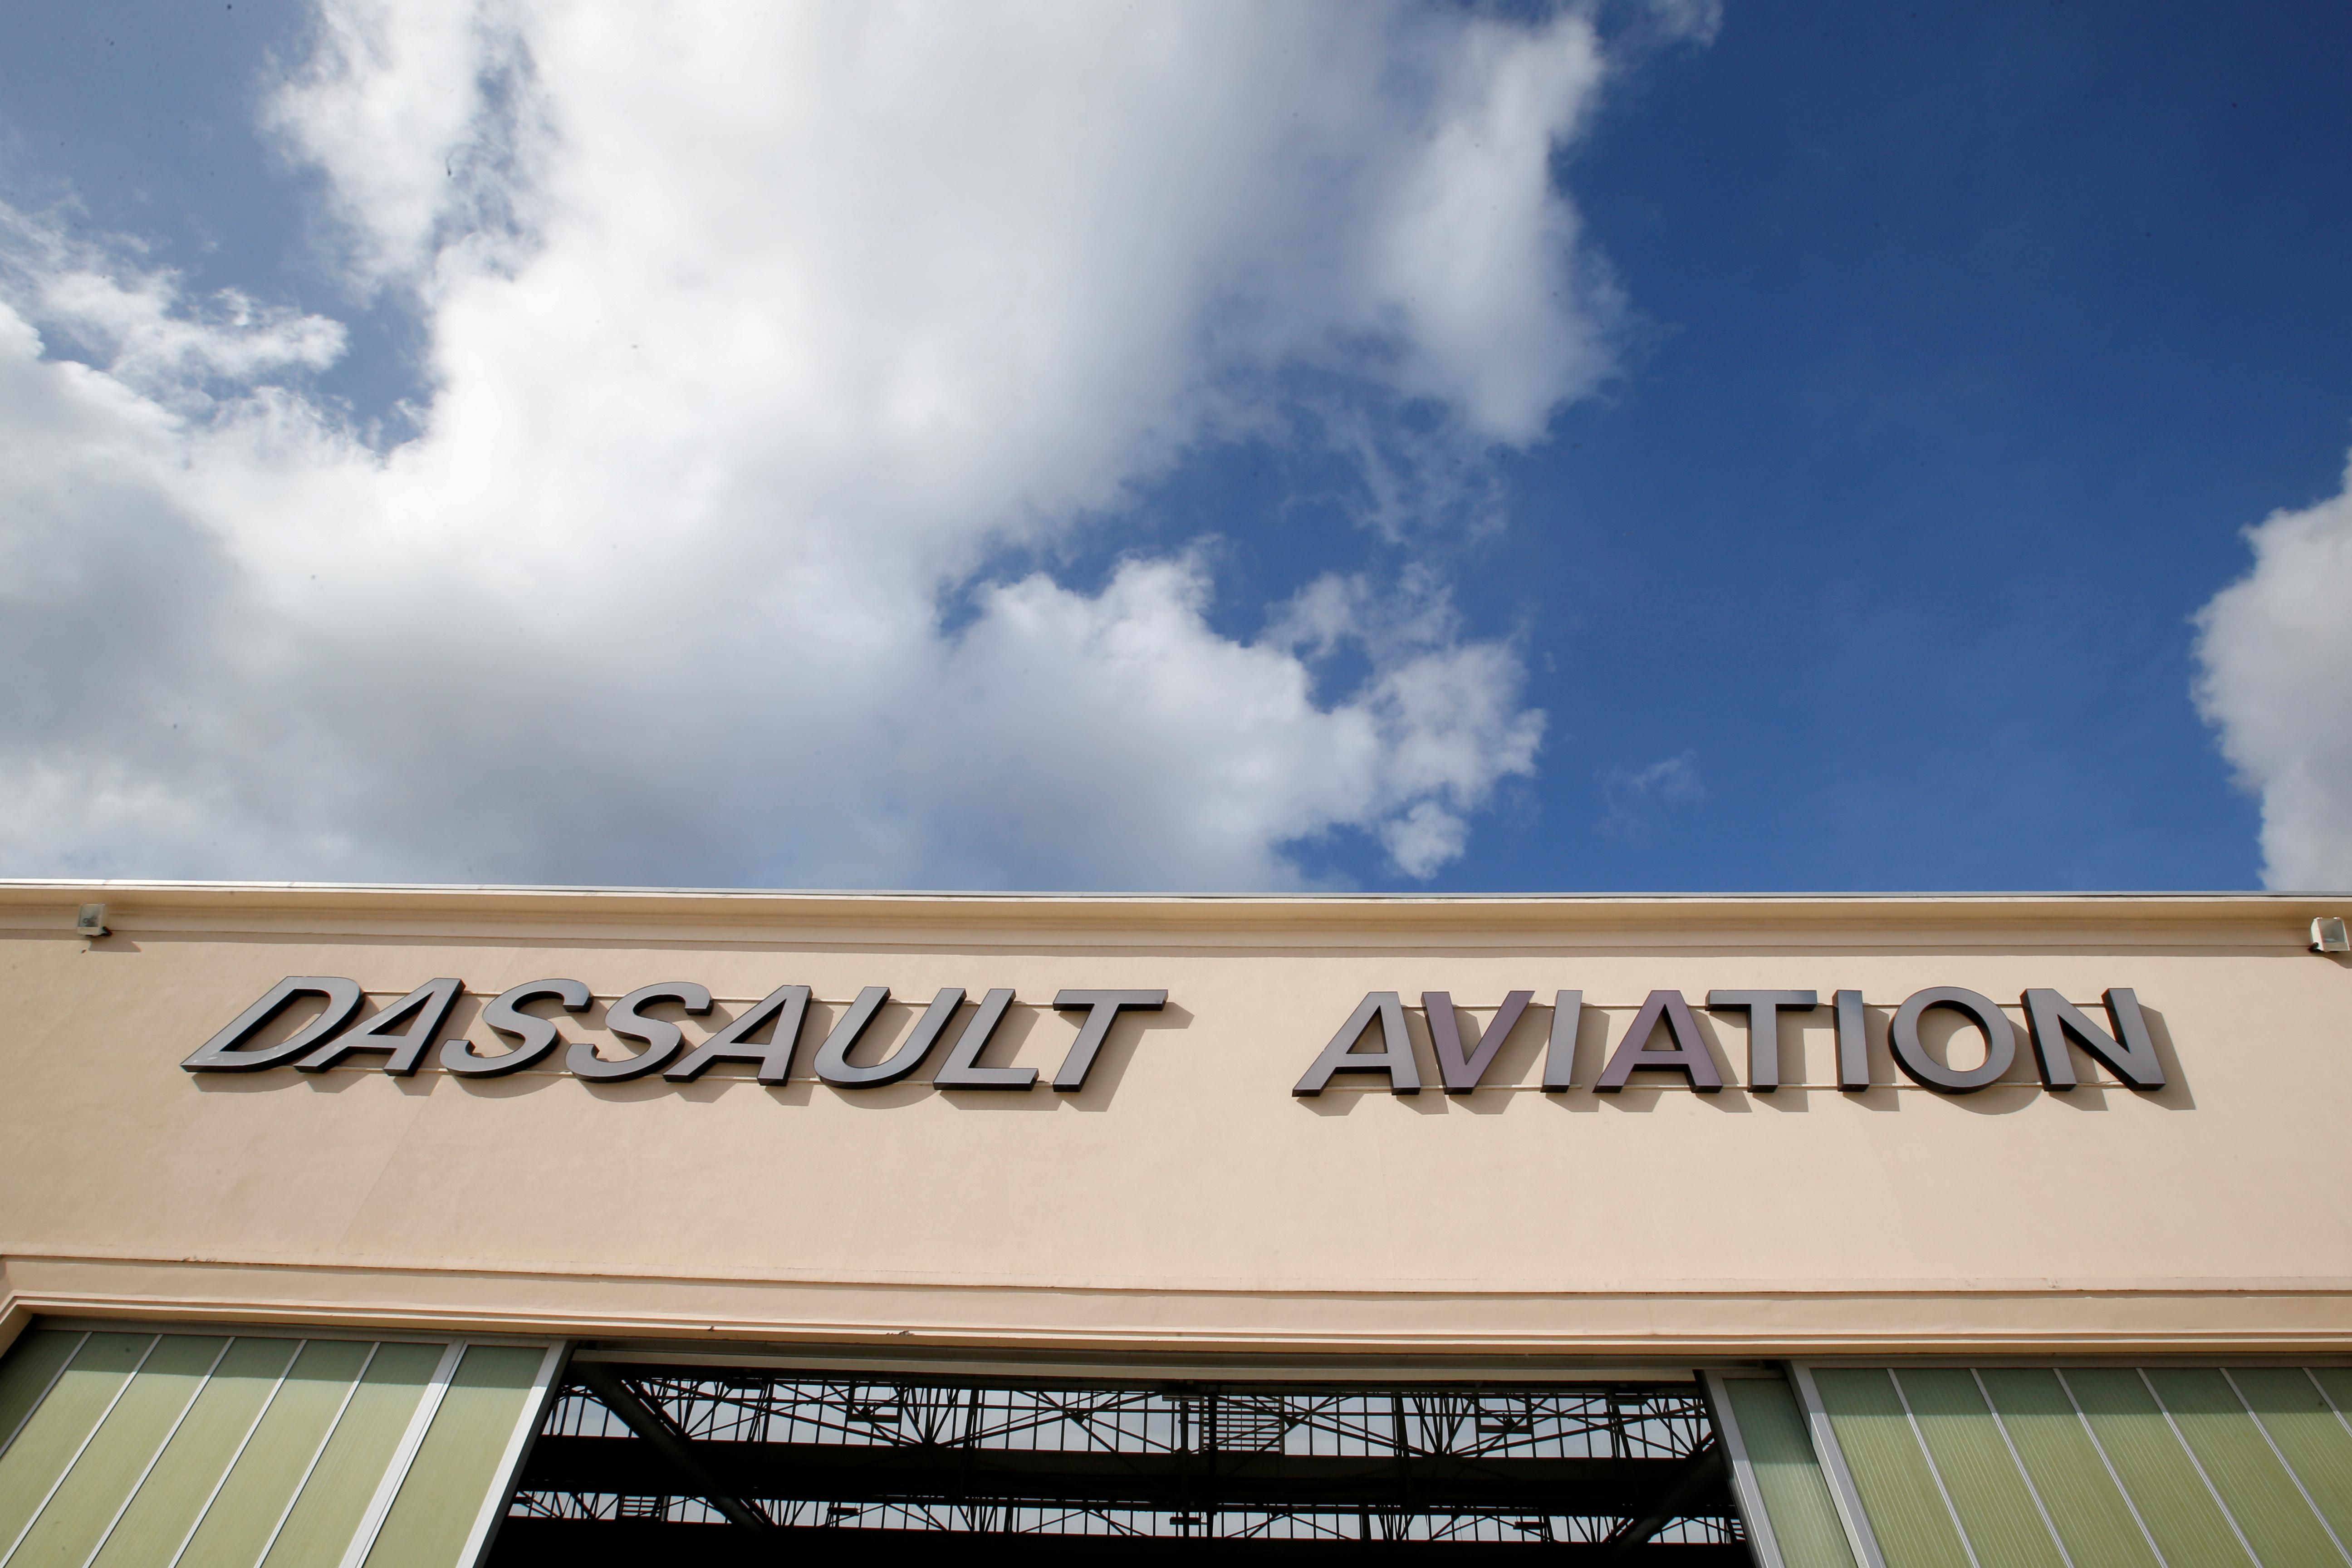 The logo of French aircraft manufacturer Dassault Aviation is seen on a hangar in Merignac near Bordeaux, France, October 8, 2019.   REUTERS/Regis Duvignau